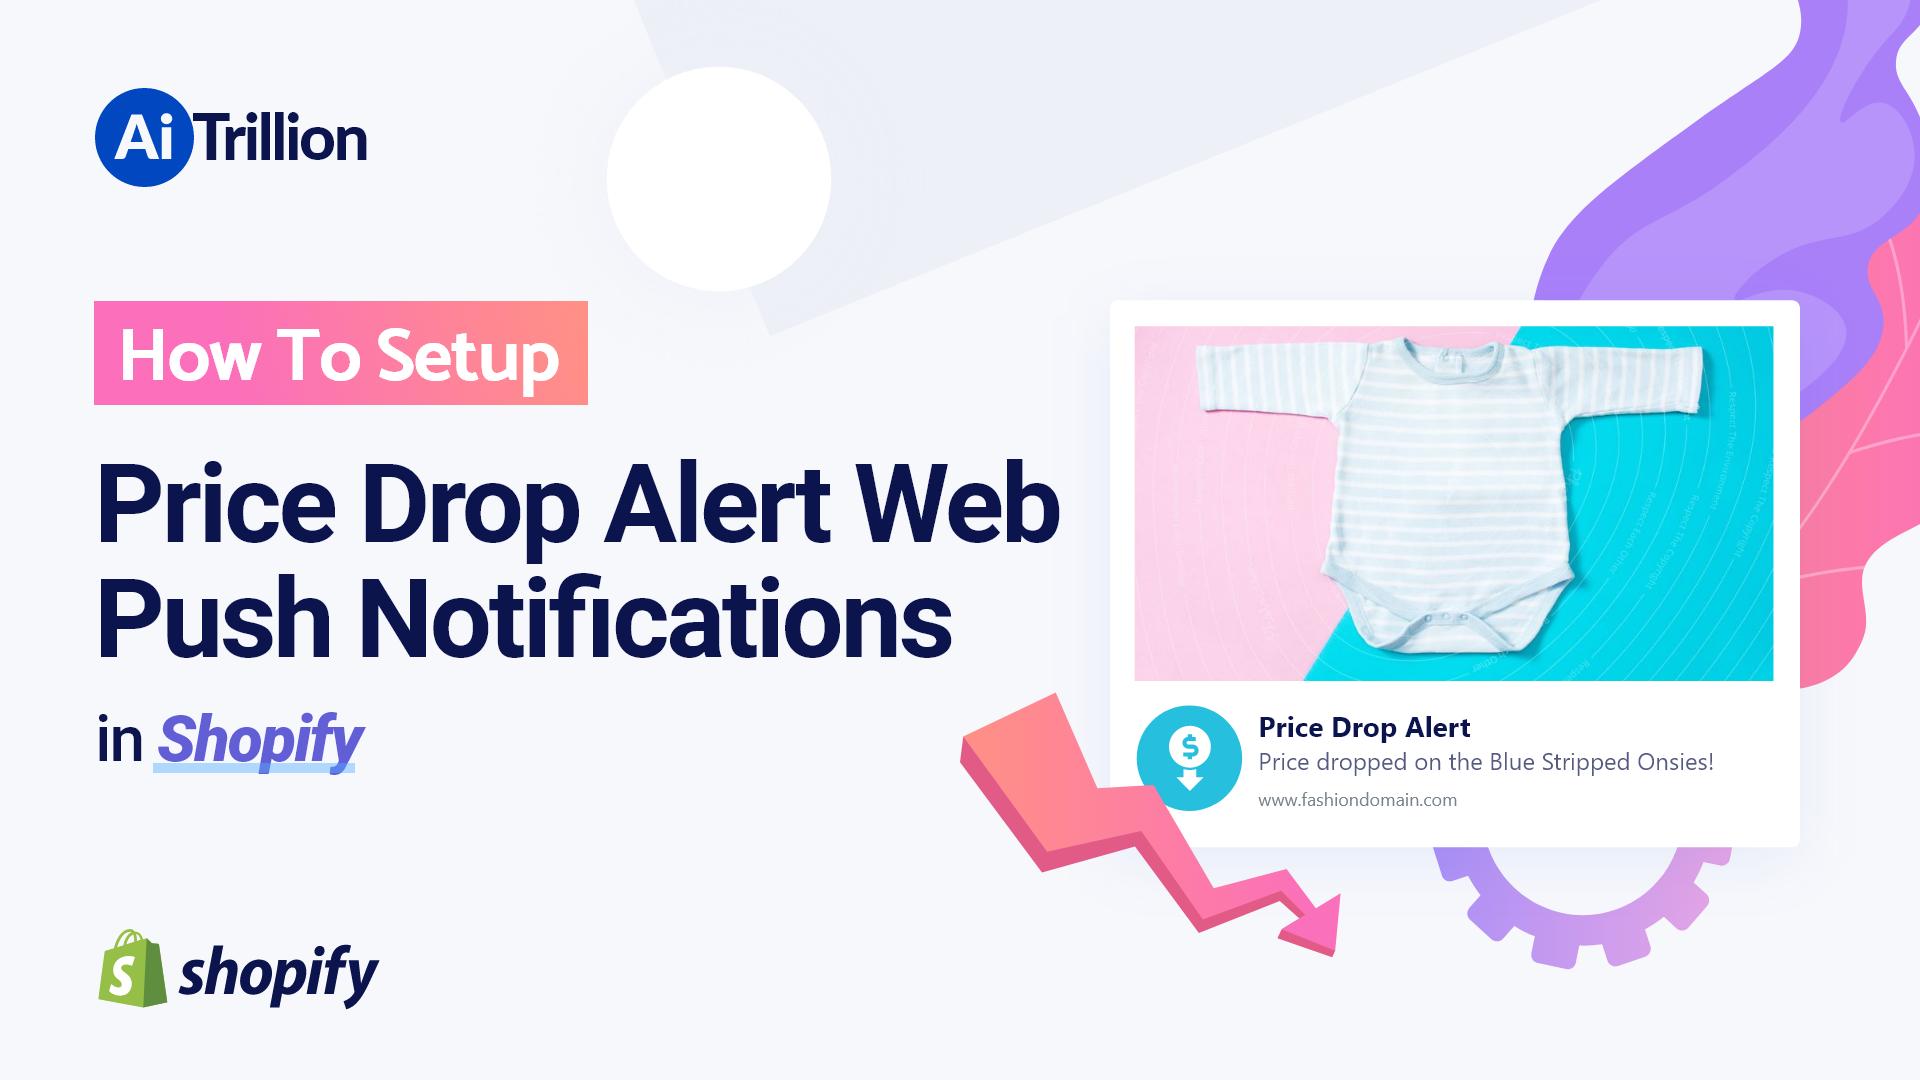 How To Setup Price Drop Alert Web Push Notifications